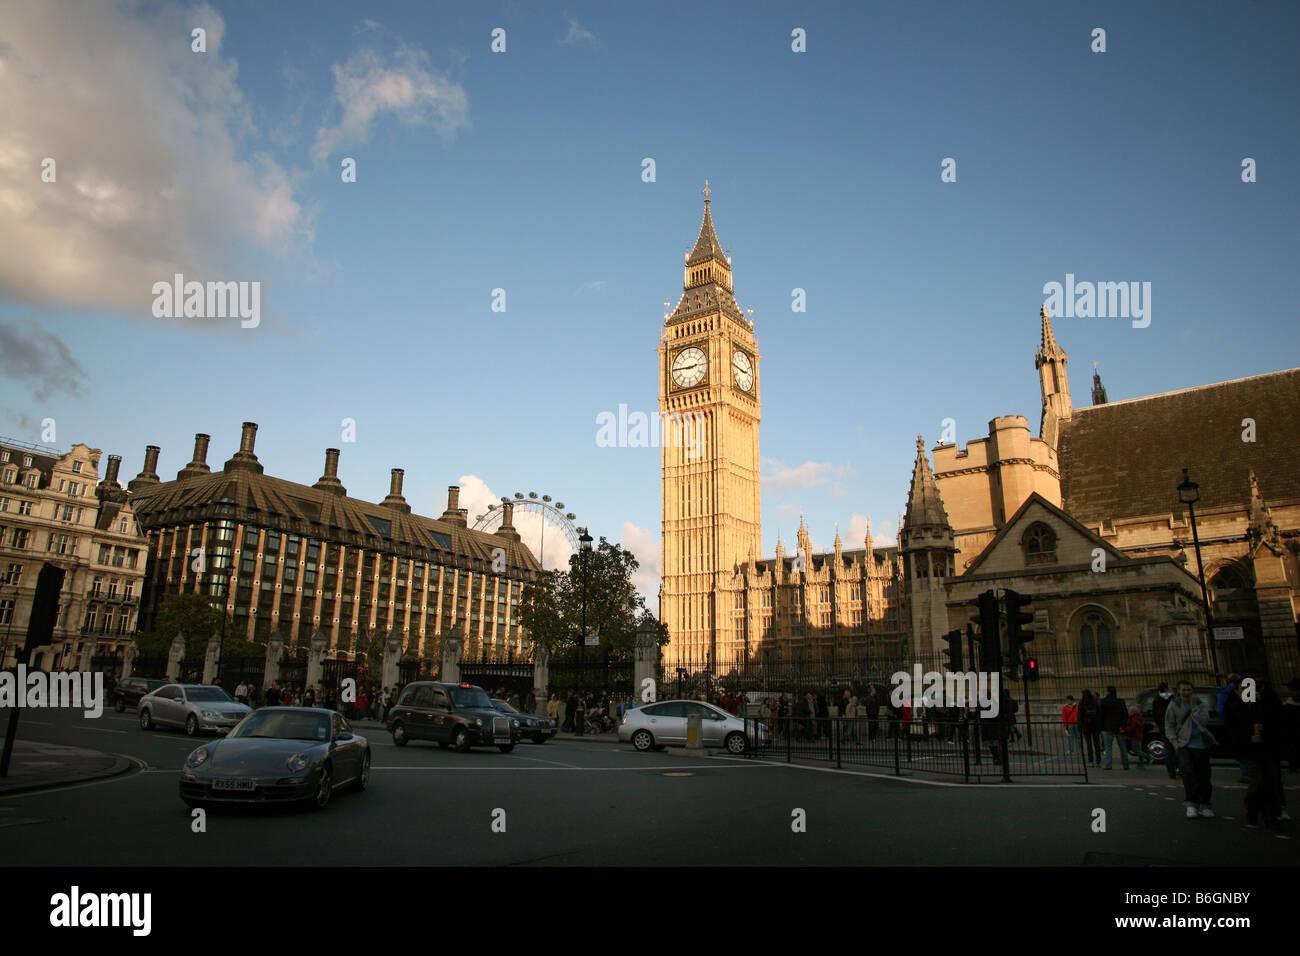 Portcullis House, London Eye & Big Ben - Stock Image